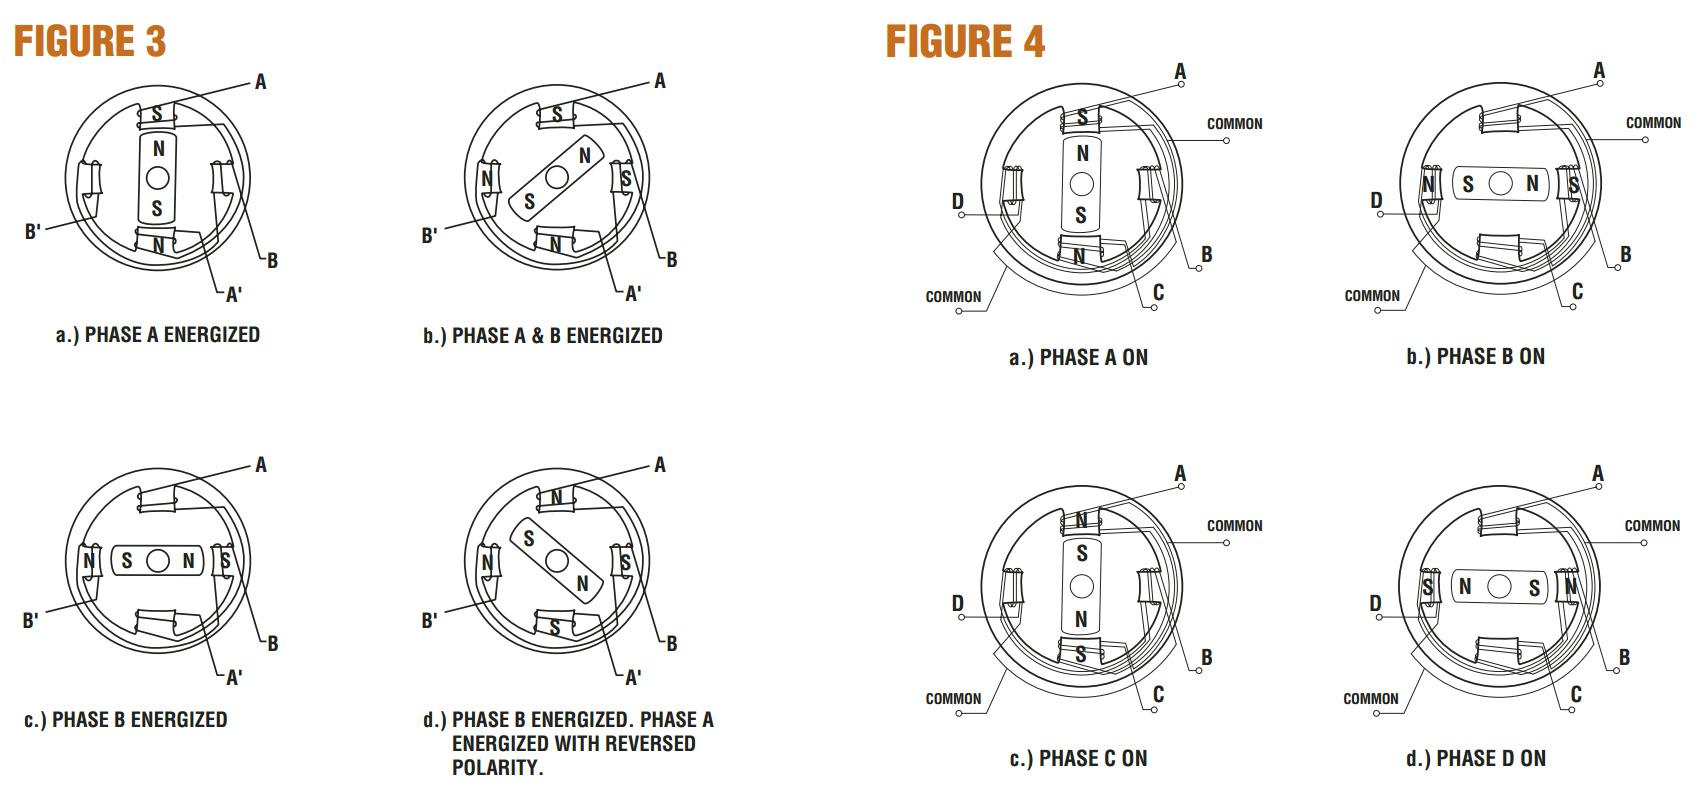 doc] ➤ diagram wiring diagram for drum controller operation of acwiring diagram for drum controller